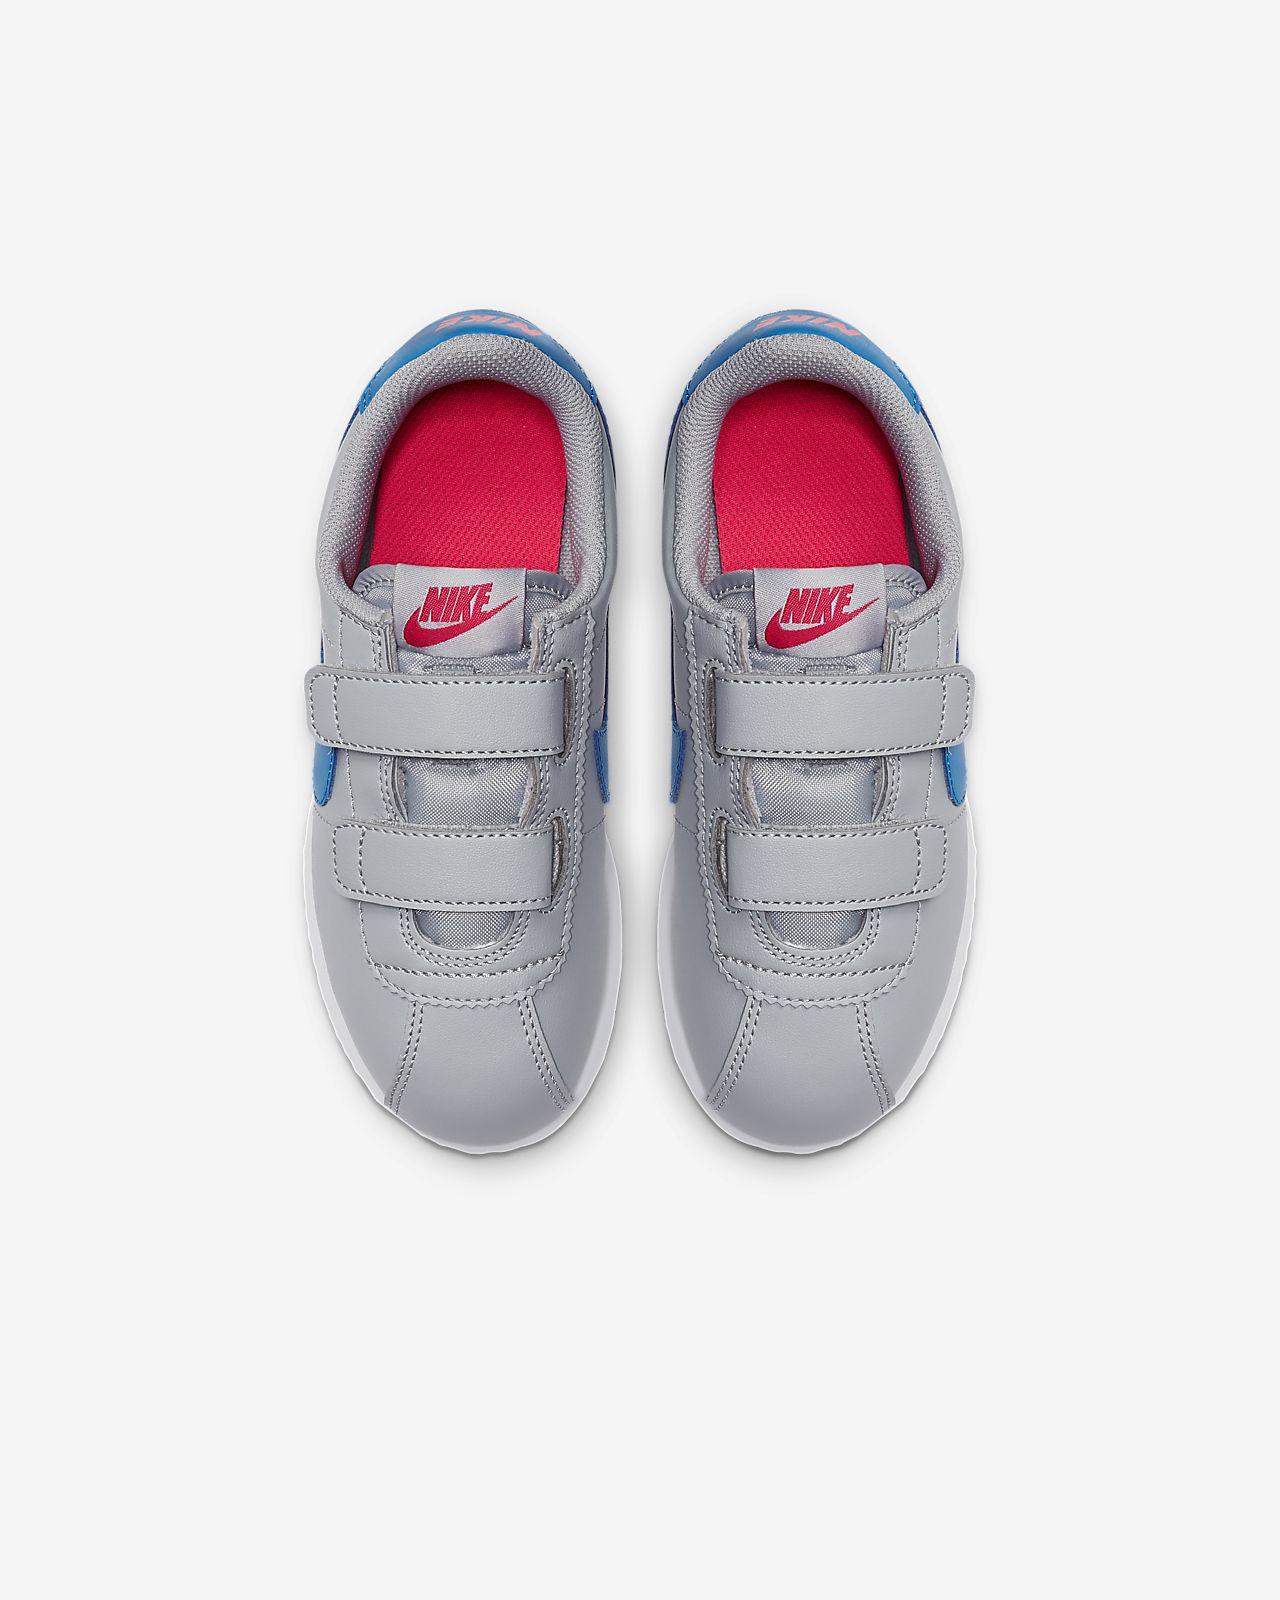 Baskets Nike Cortez Basic SL Blanc Blanc, gris Achat